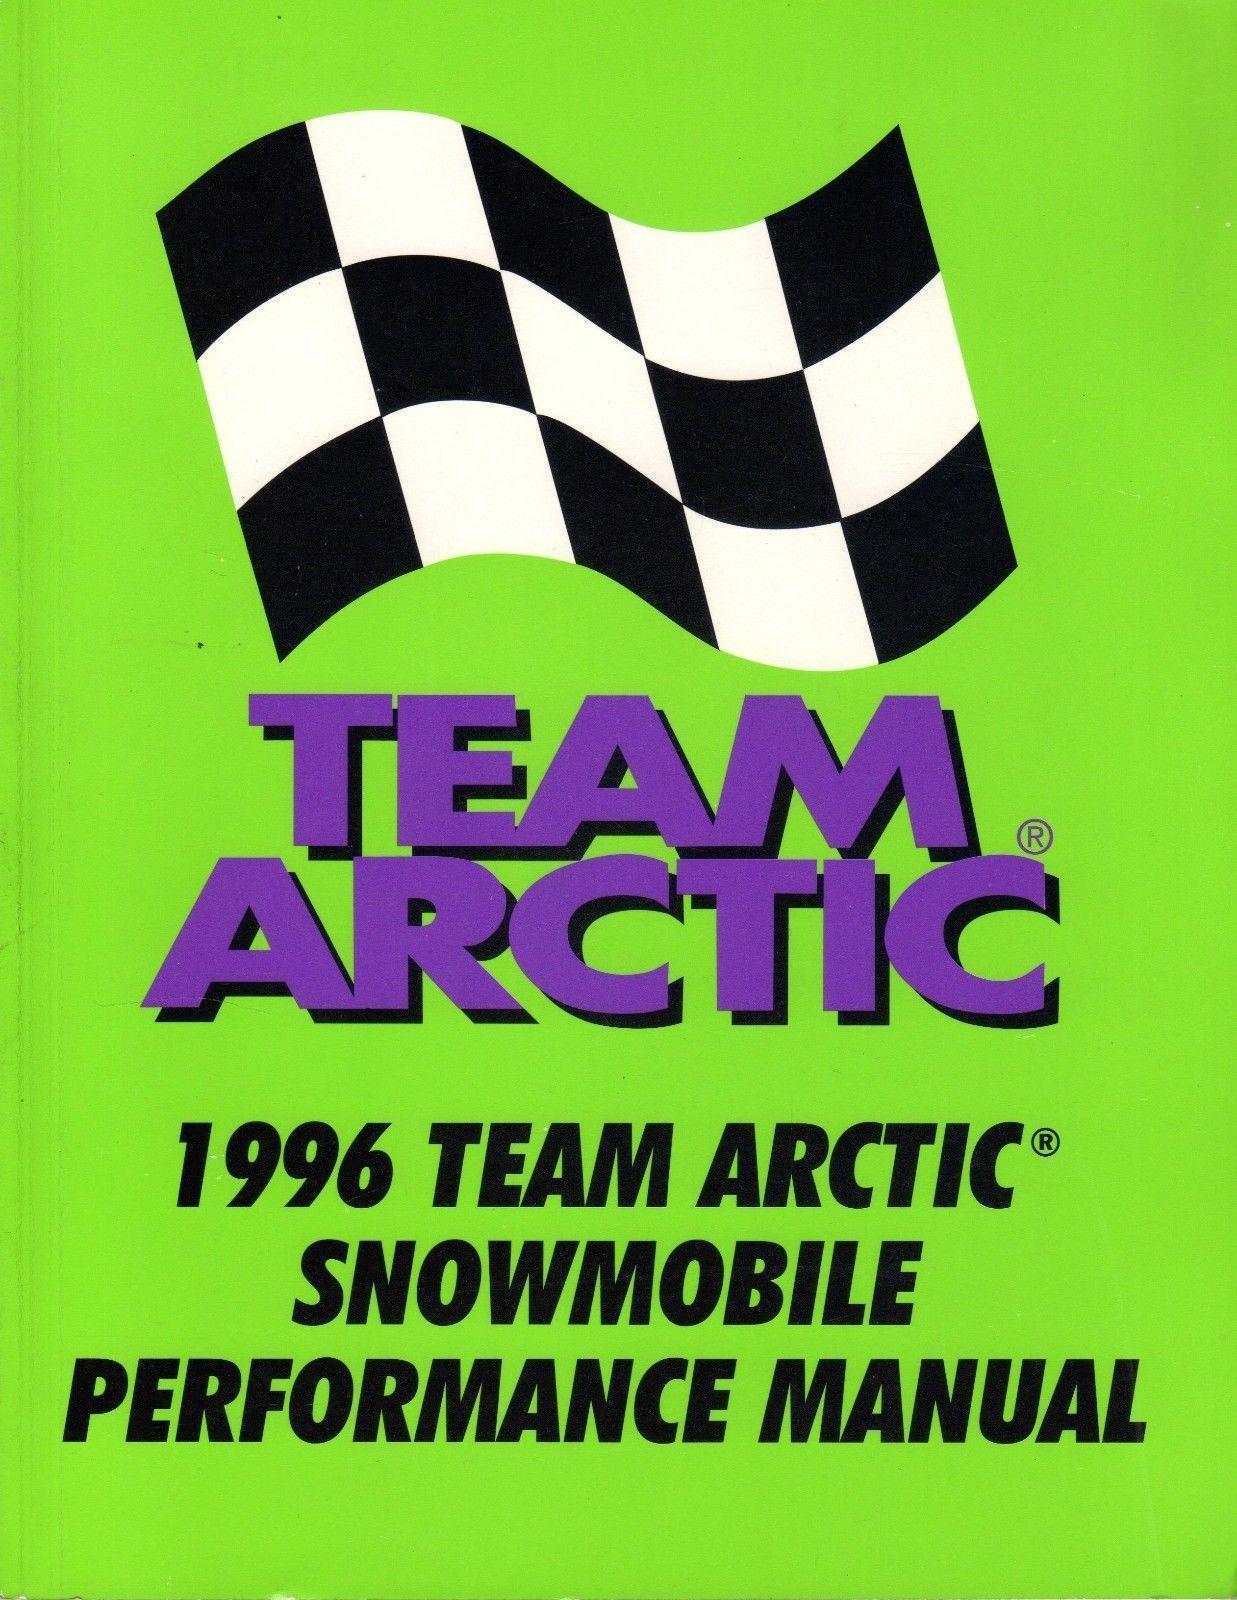 1996 ARCTIC CAT TEAM SNOWMOBILE PERFORMANCE SERVICE MANUAL P/N 2255-320 (150